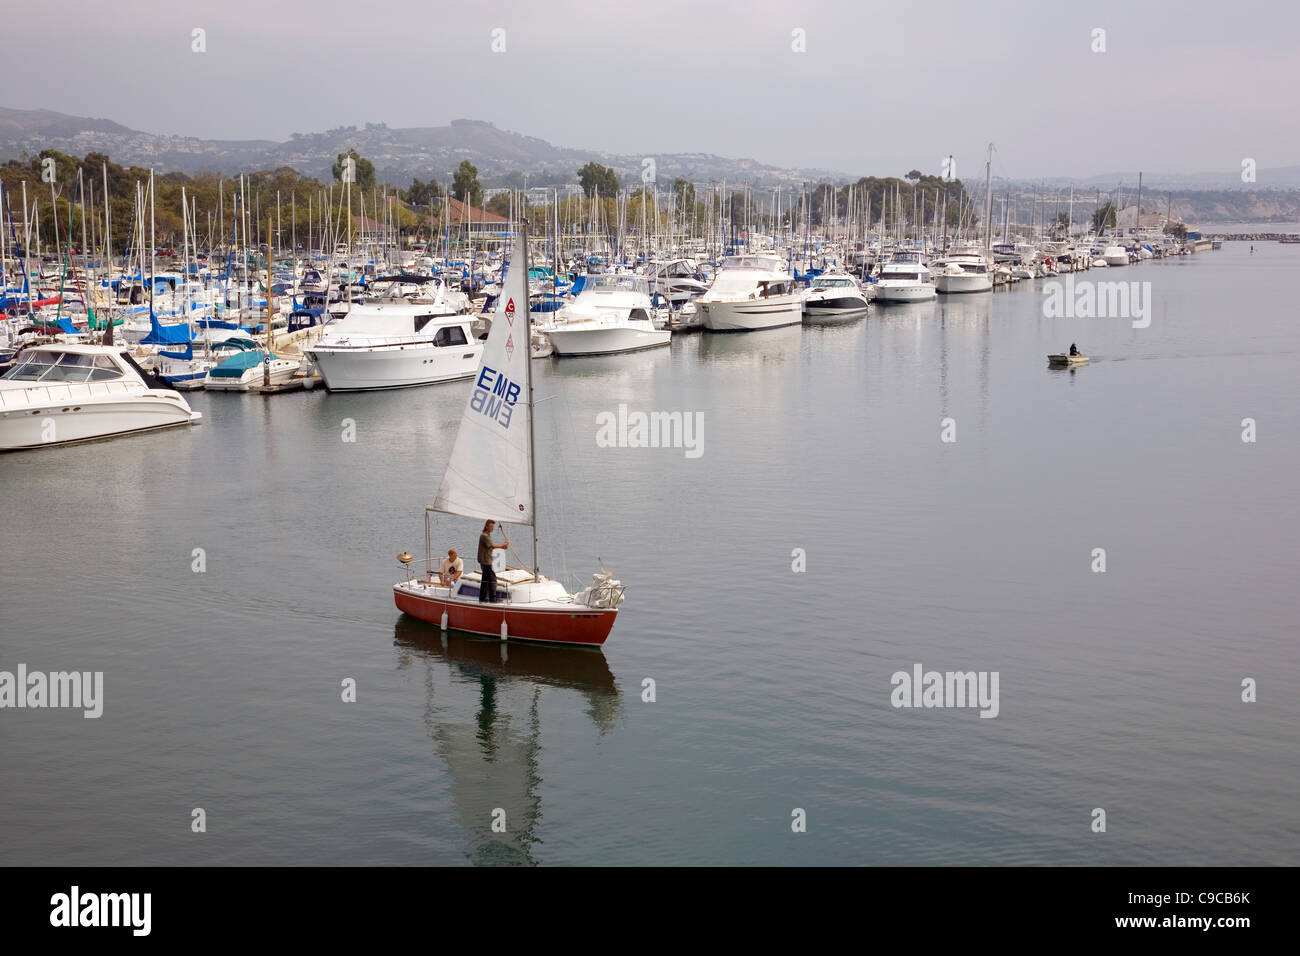 Dana Point Harbor - California - Stock Image